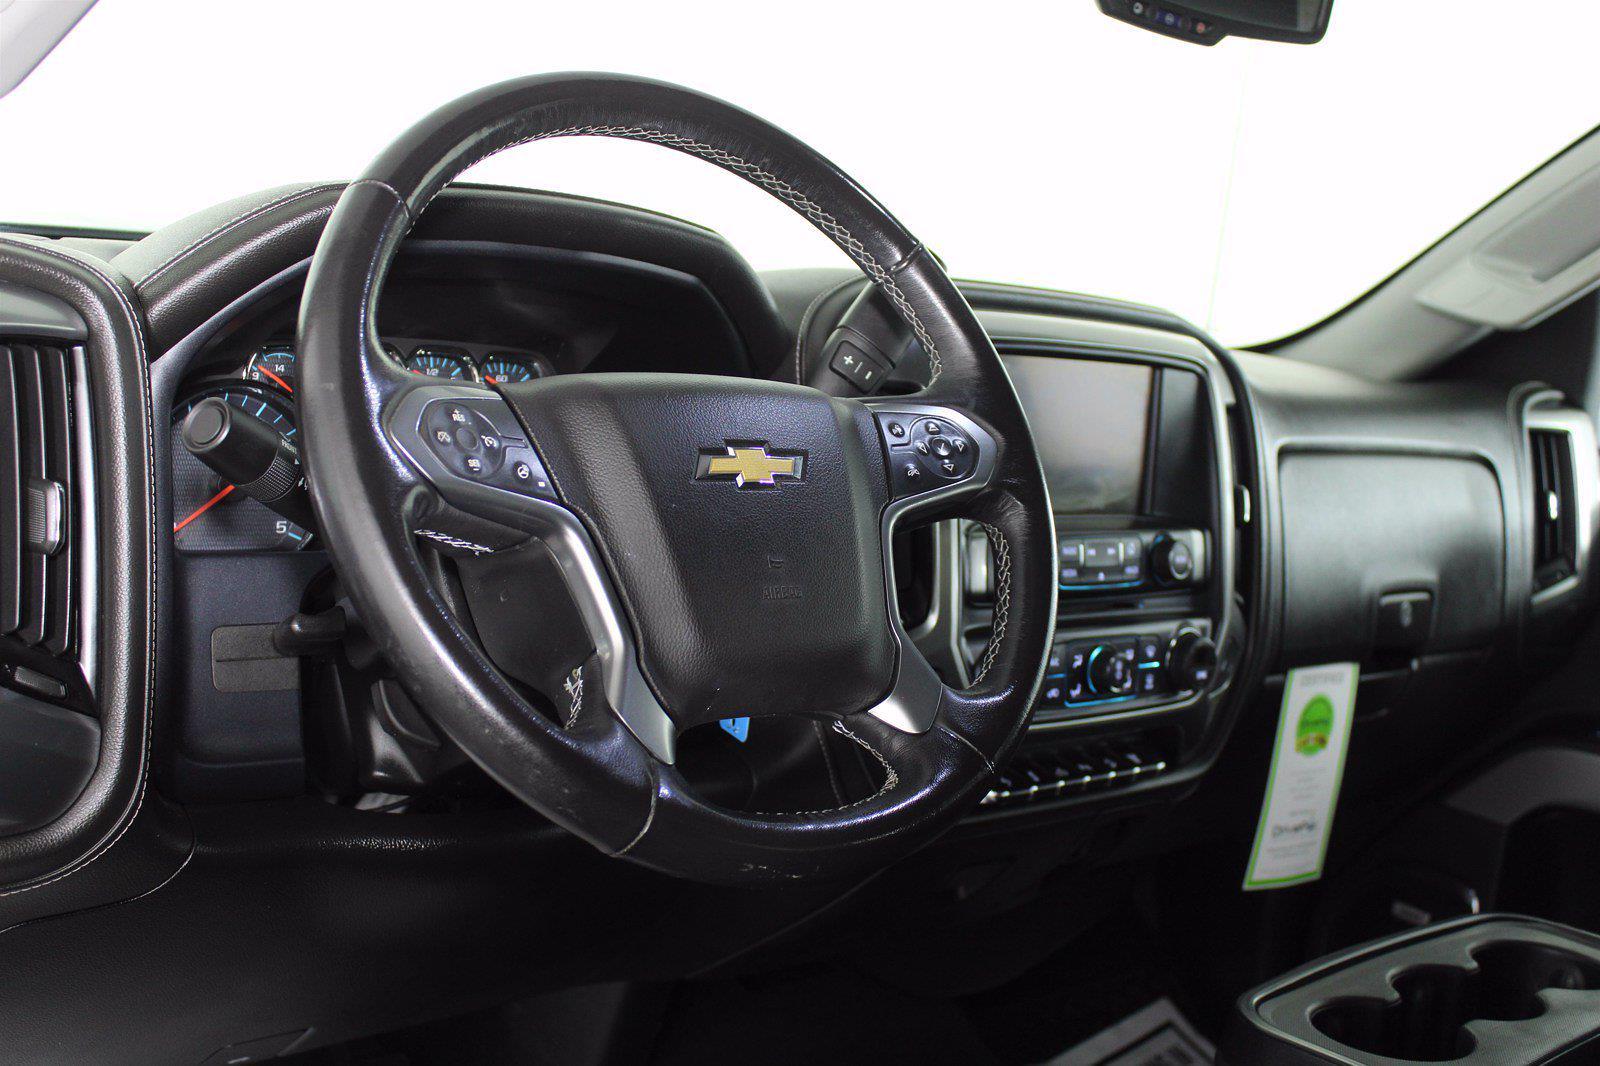 2017 Chevrolet Silverado 3500 Crew Cab 4x4, Pickup #D111017A - photo 15